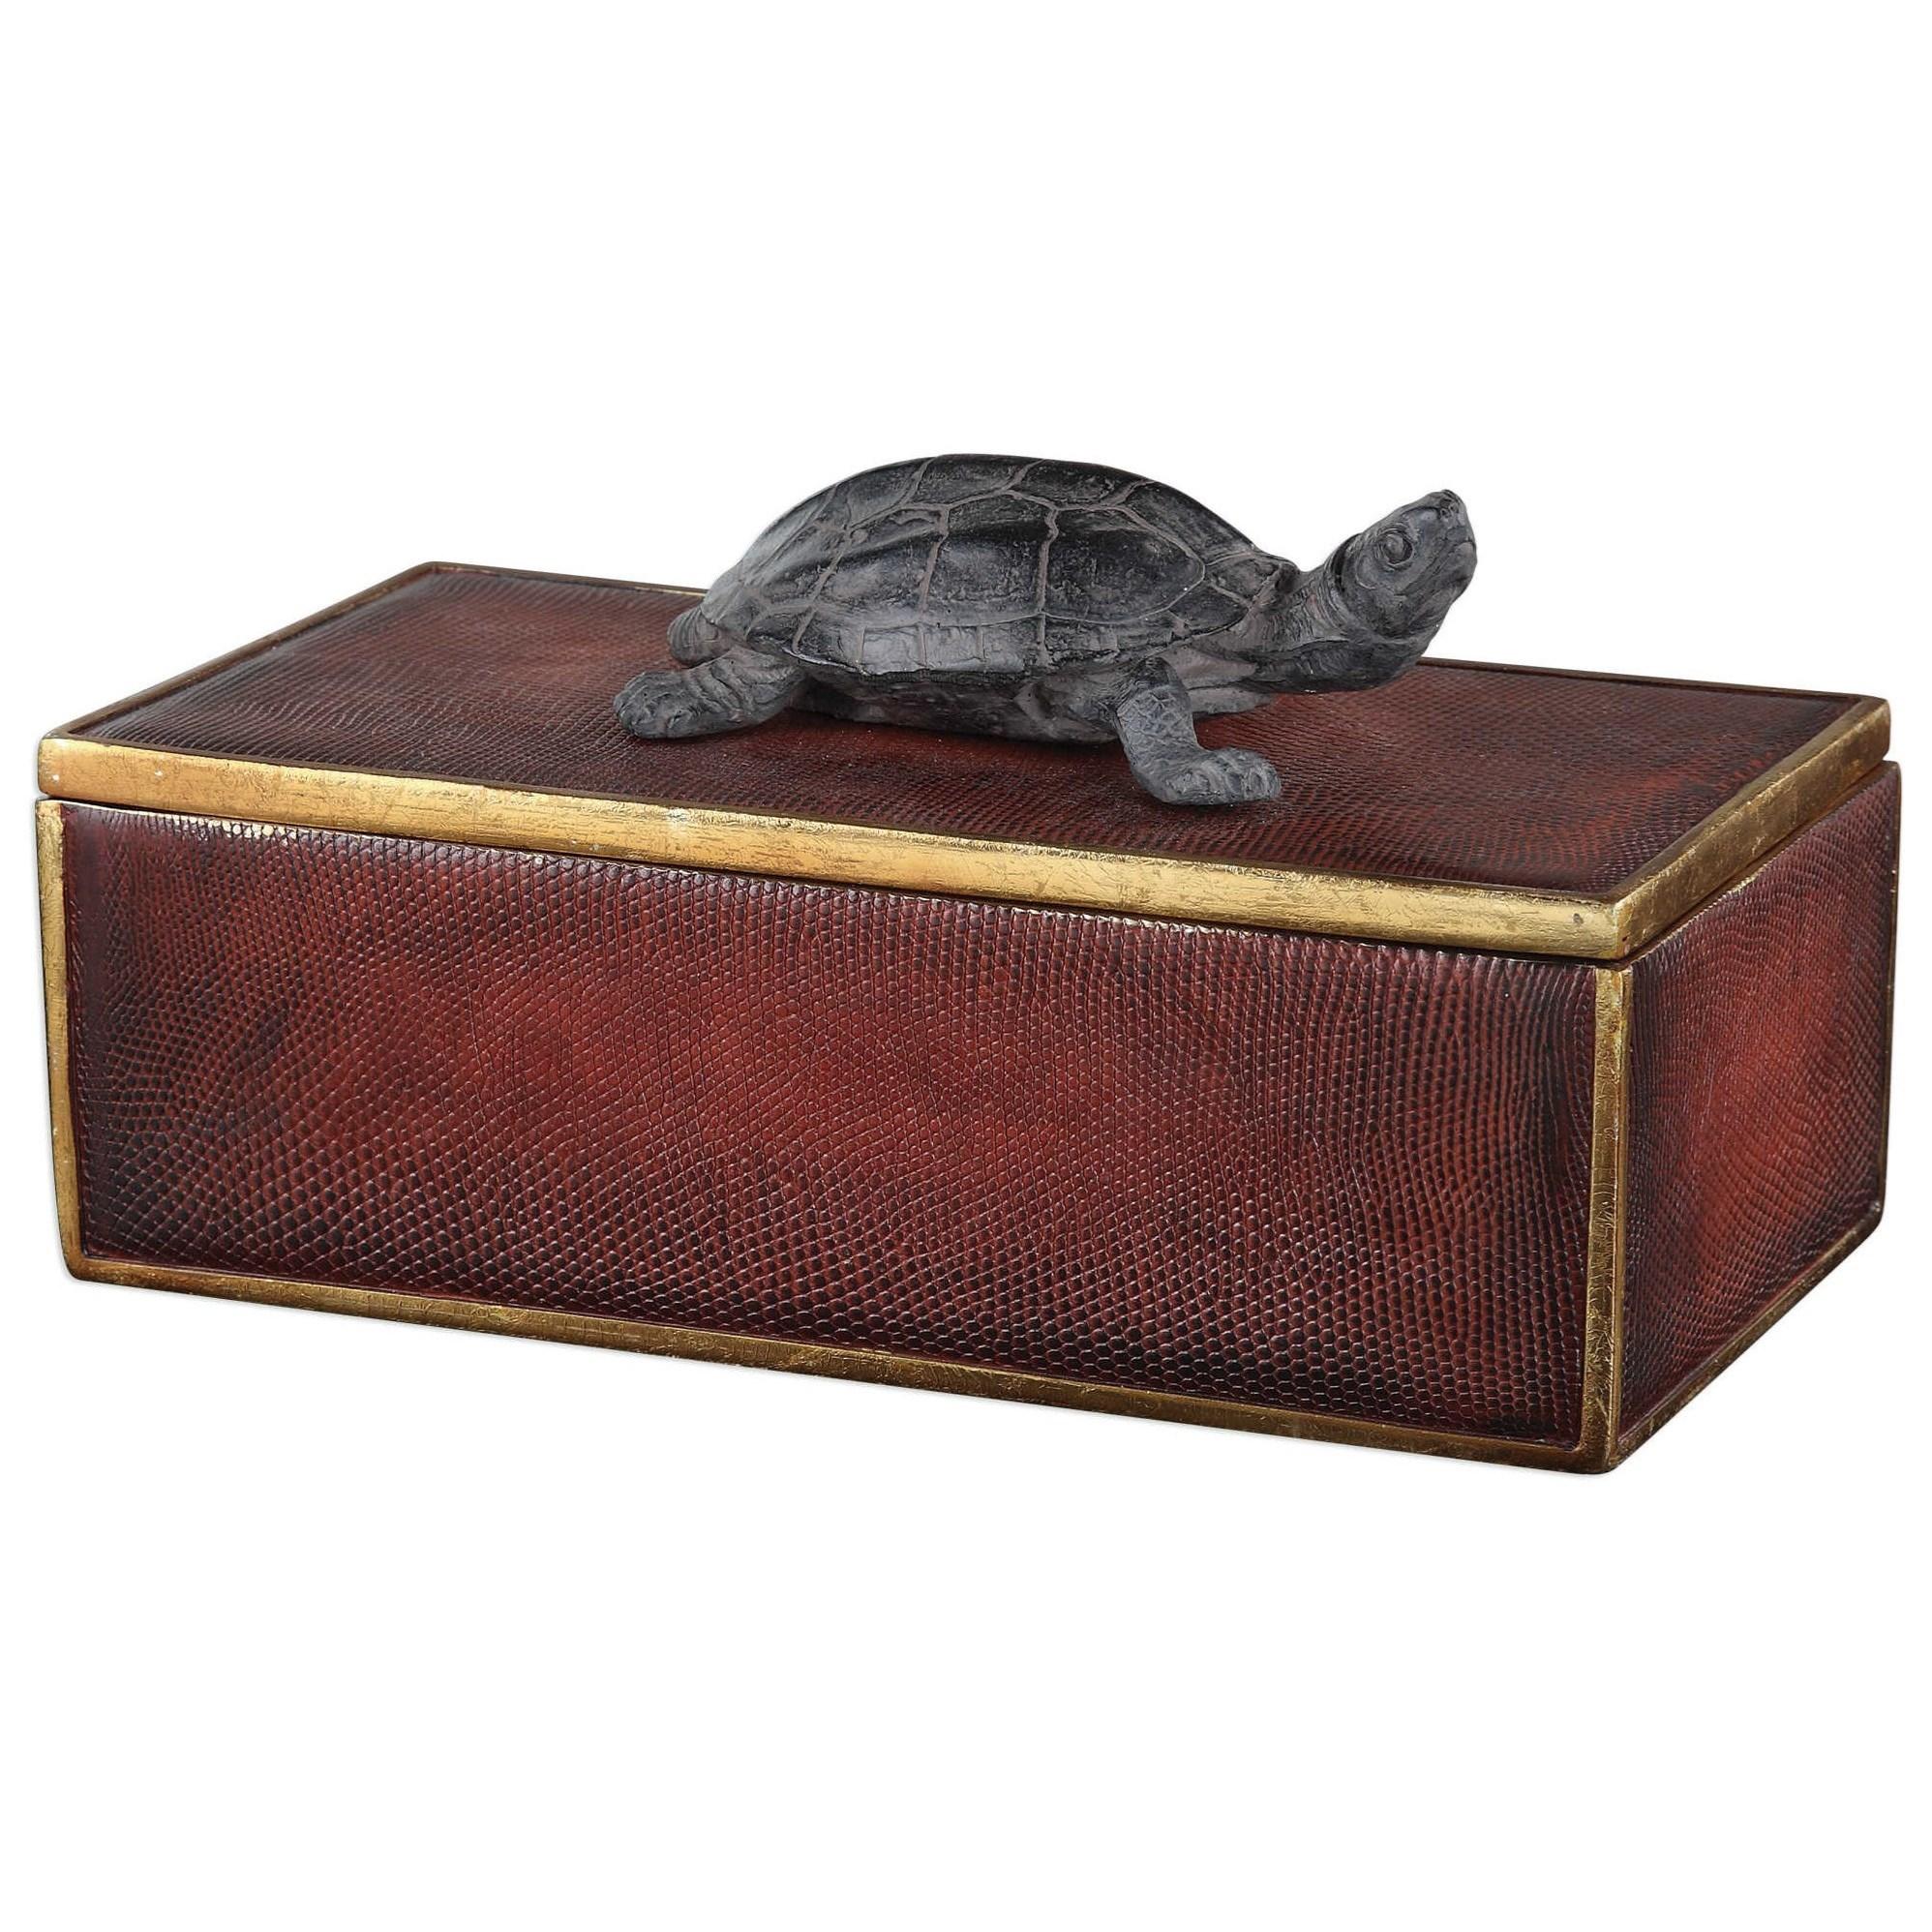 Neagan Chestnut Brown Box